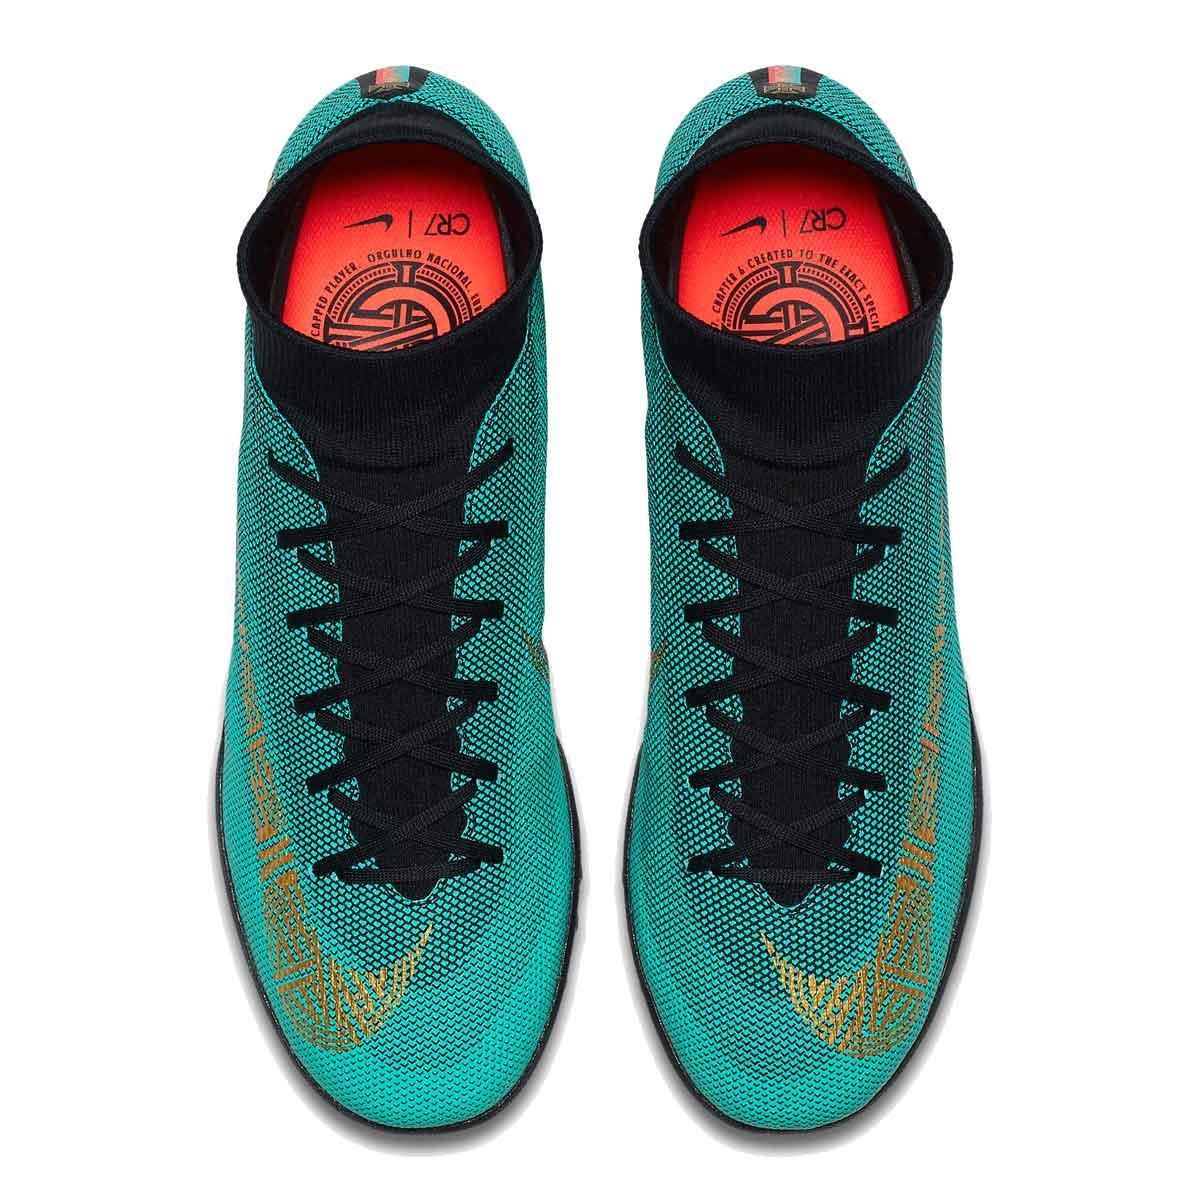 9a150f60c3 Chuteira Society Nike MercurialX Superfly 6 Academy CR7 Masculino